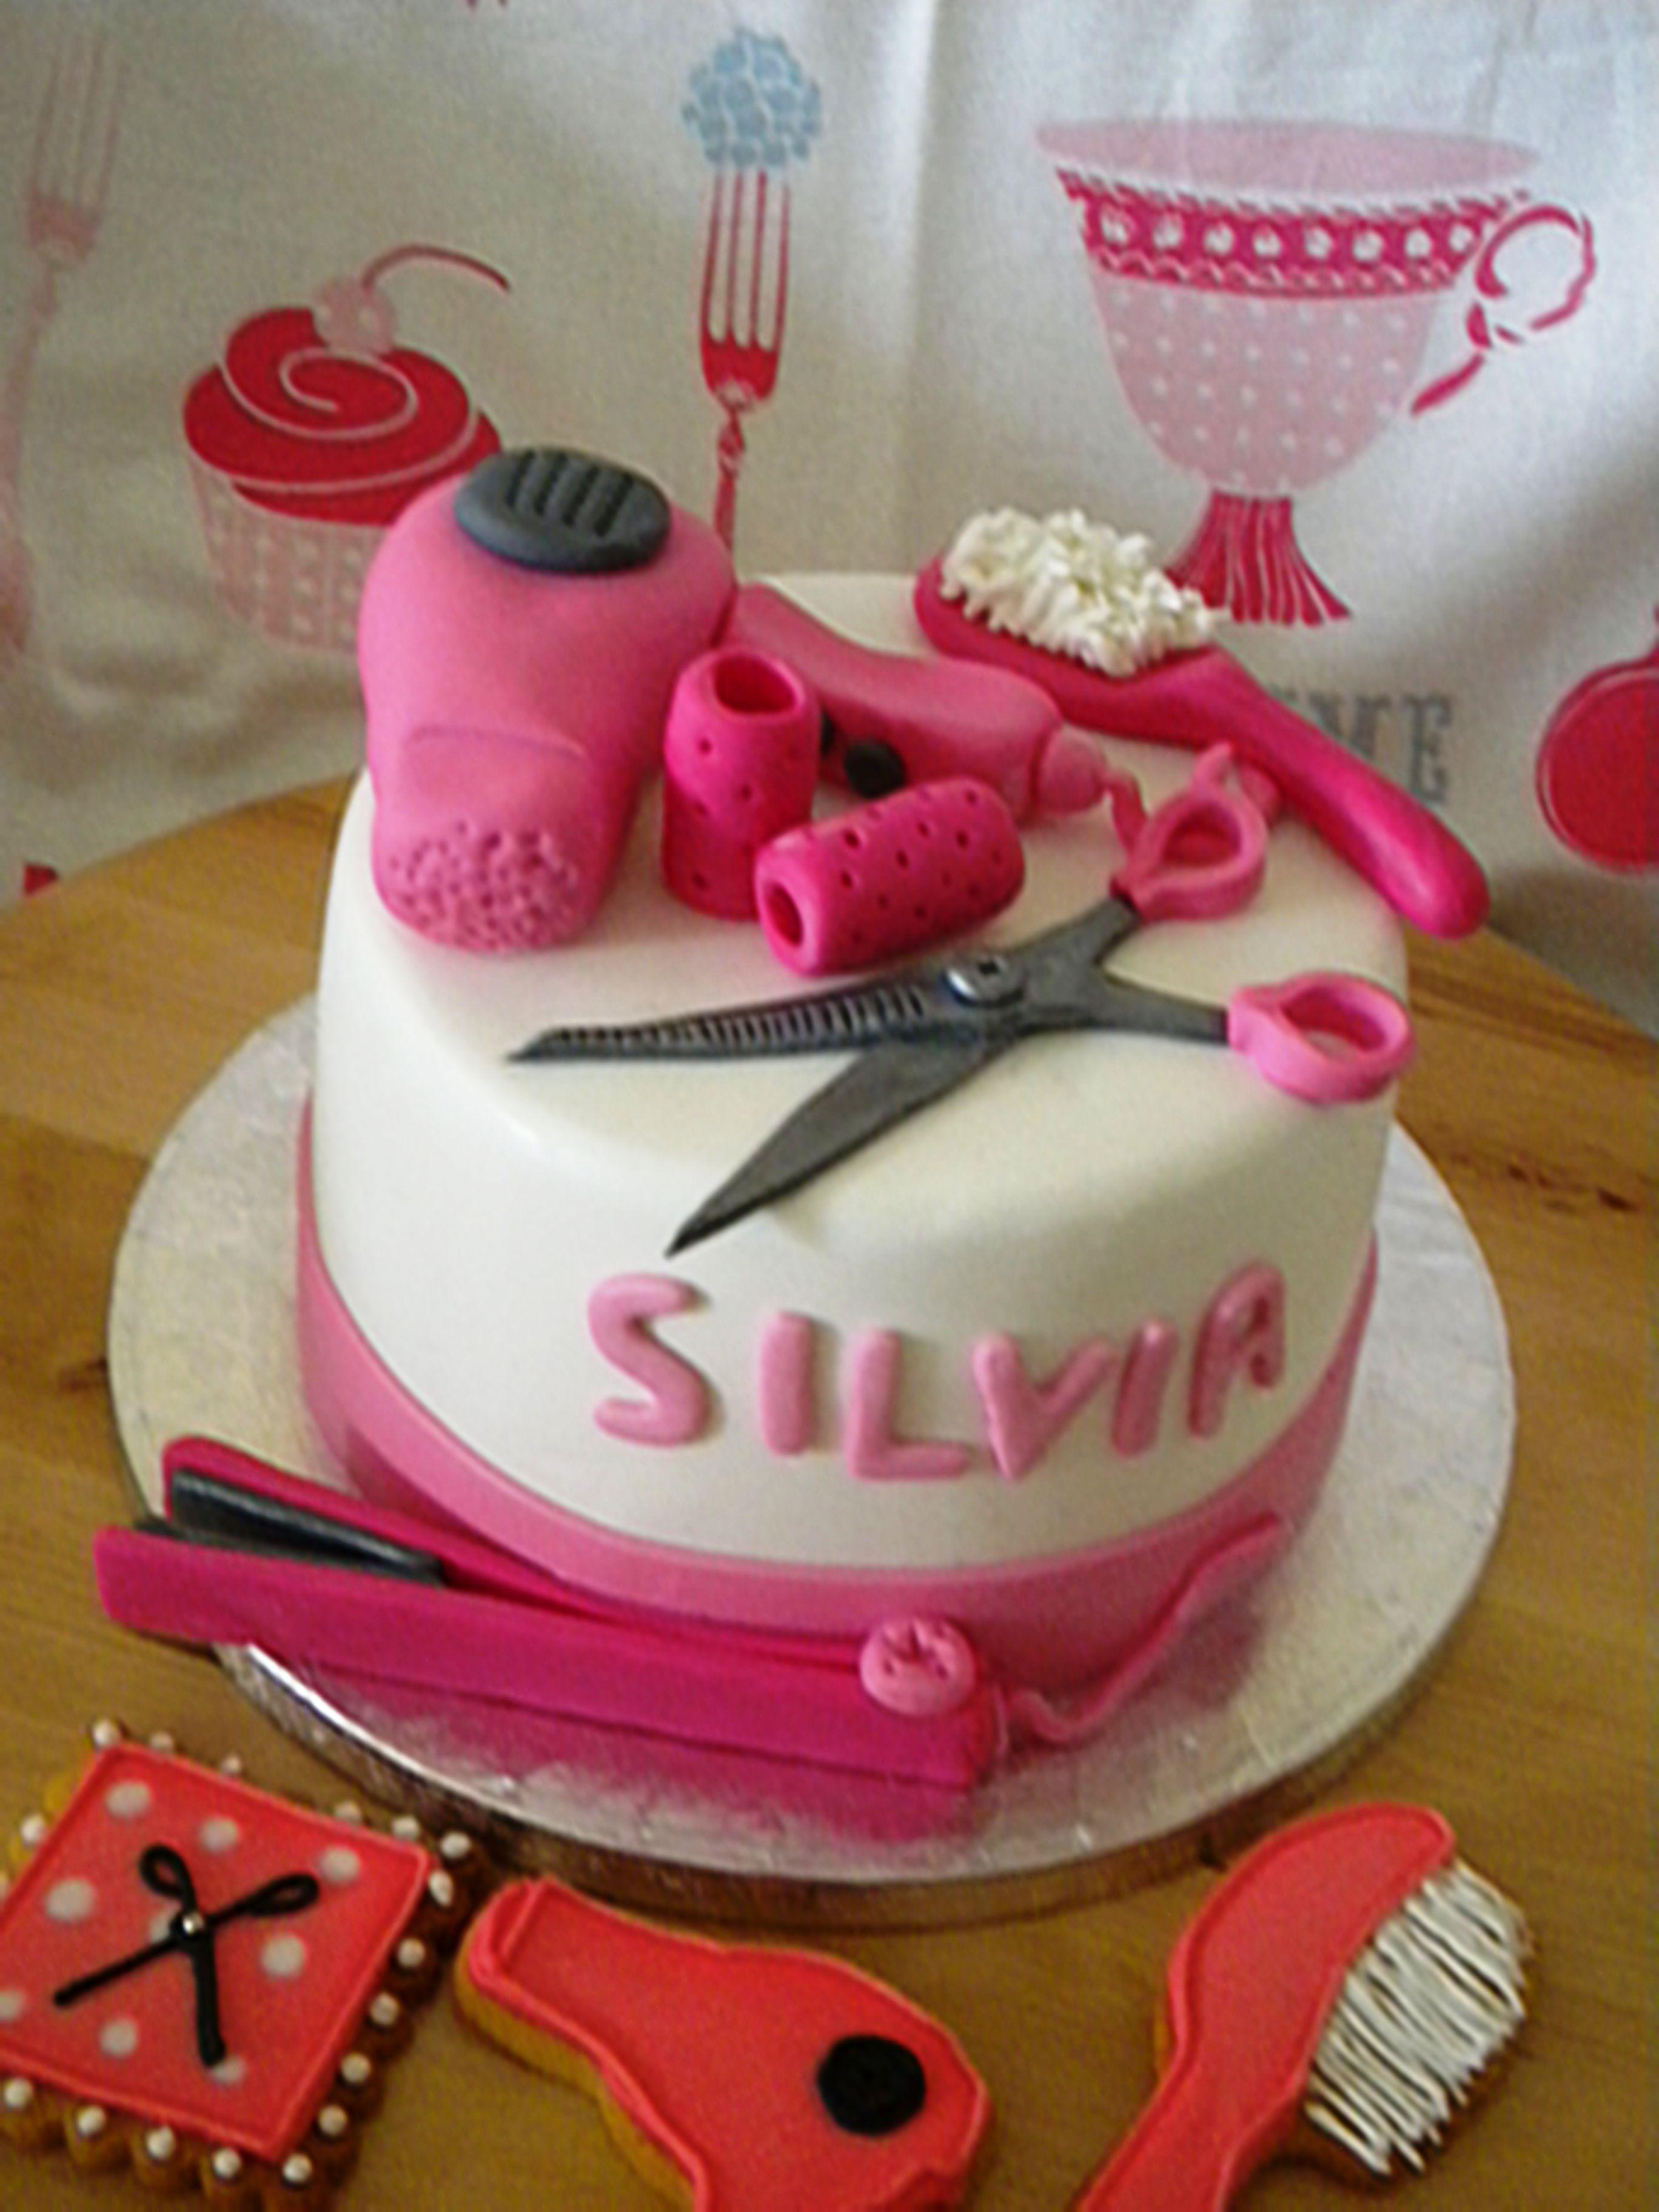 Hair stylist cake @Tracy Bryson I soooo want this cake for my